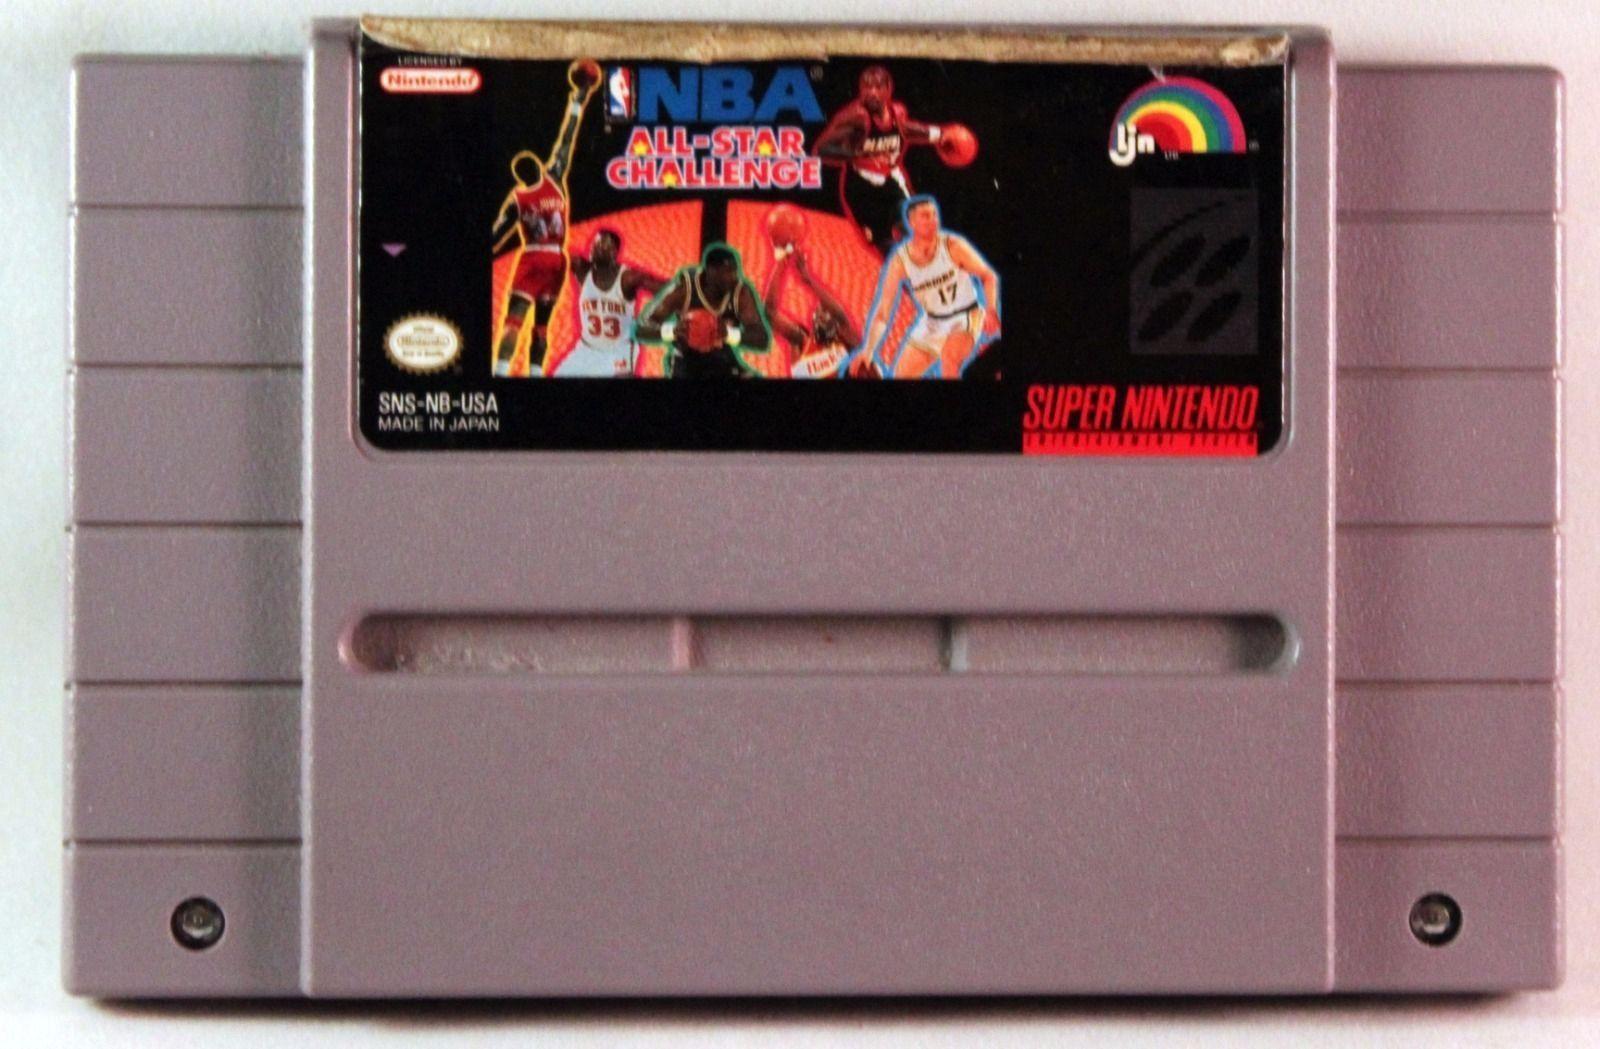 NBA All-Star Challenge (Nintendo SNES, 1992)